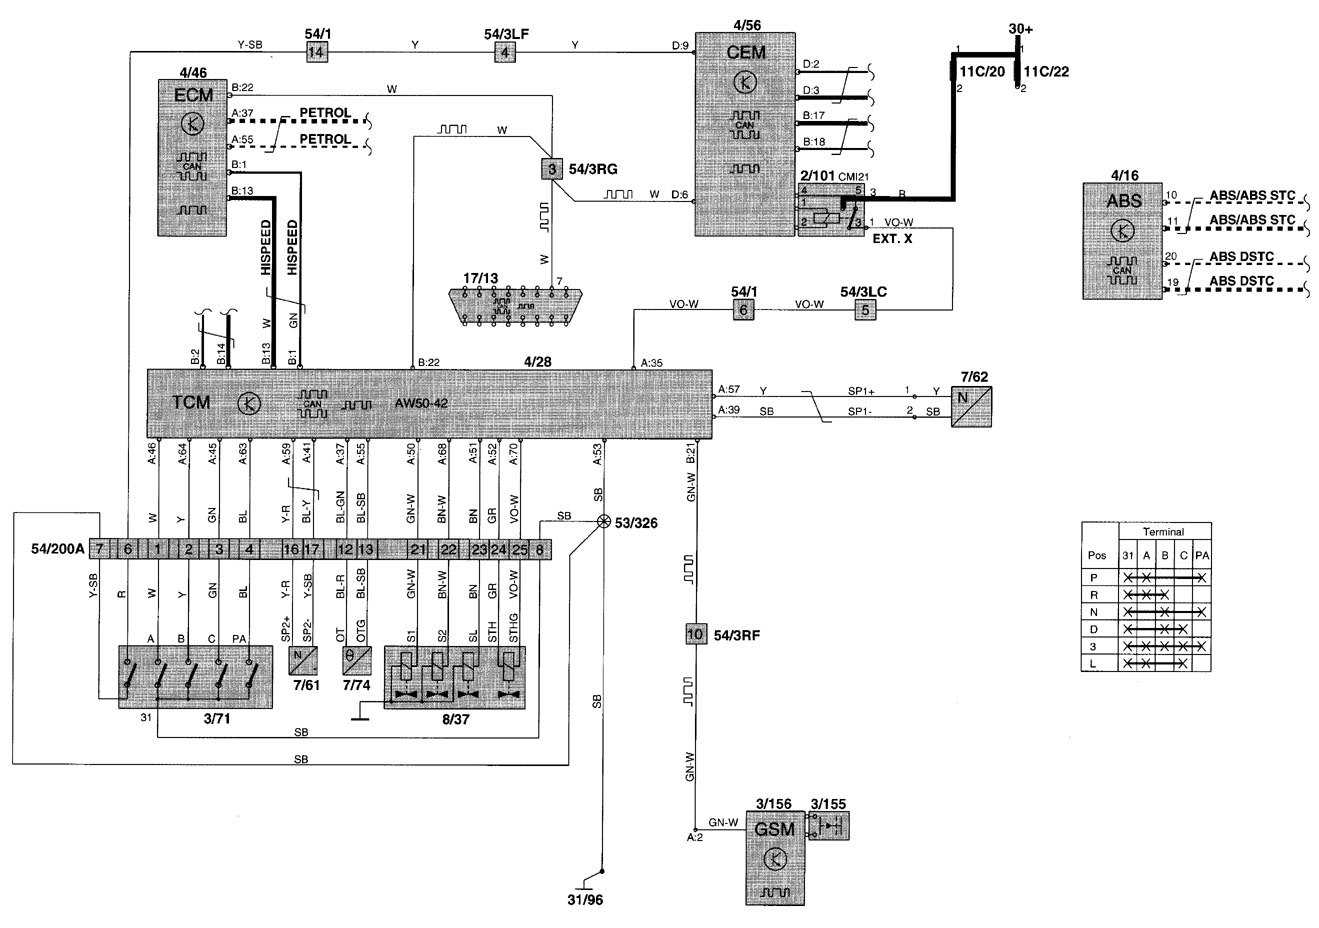 volvo v70 wiring diagram 2000 lifan 110cc diagrams transmission controls